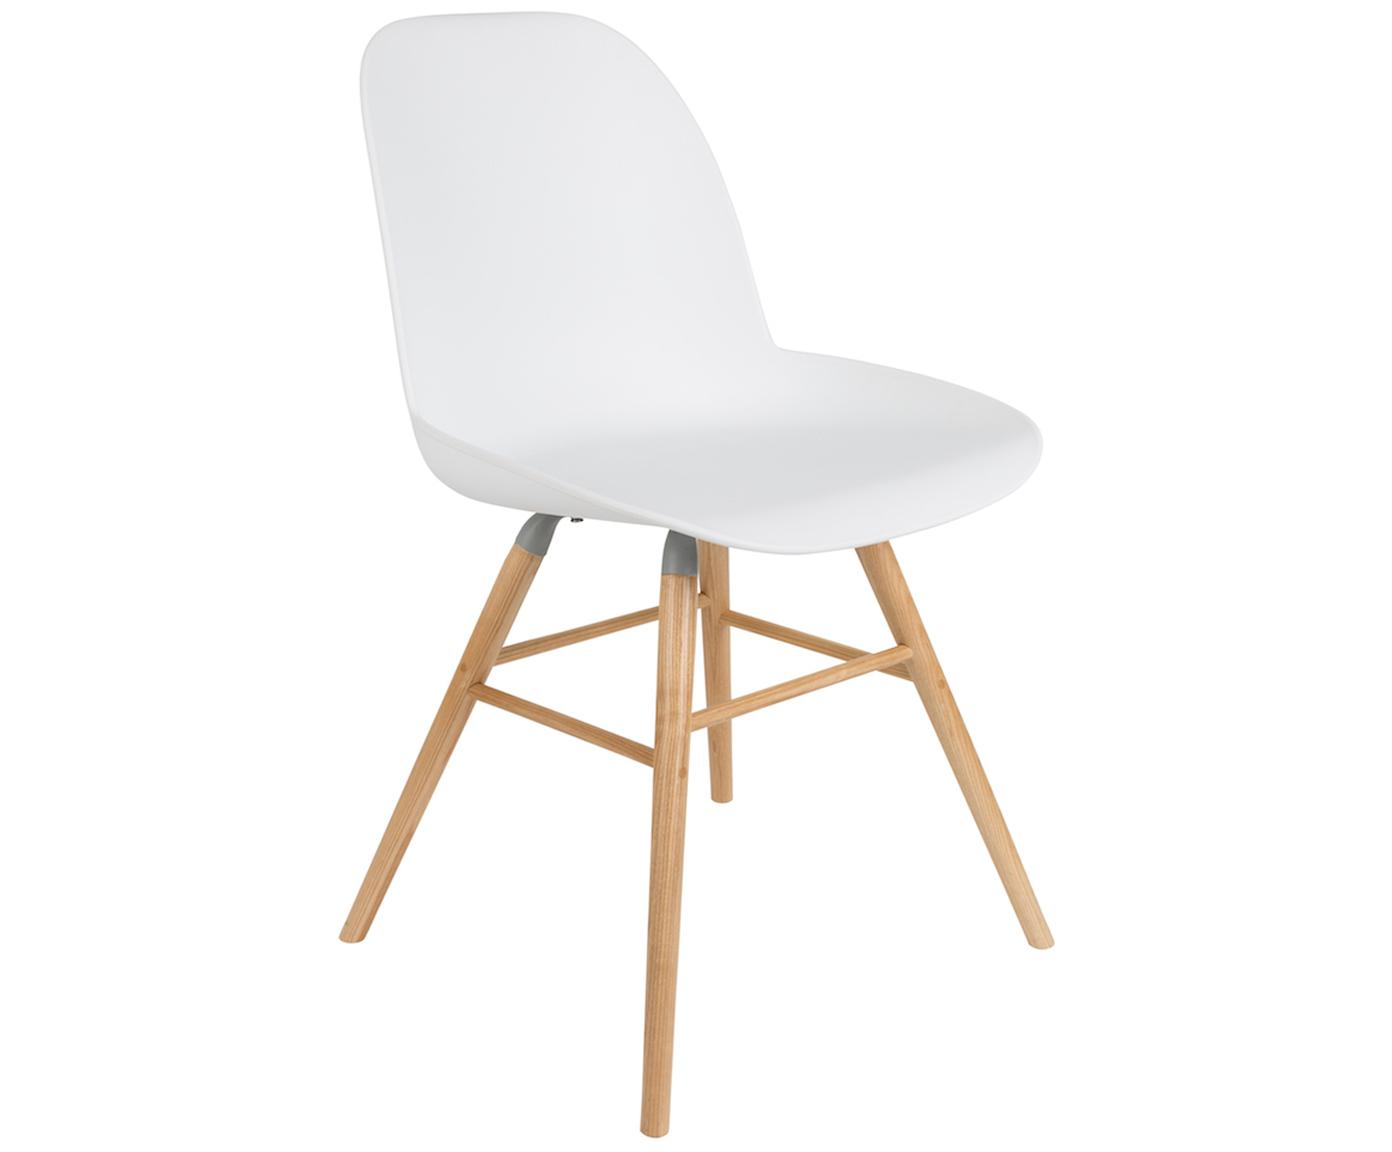 Sedia Albert Kuip, Seduta: 100% polipropilene, Piedini: legno di frassino, Bianco, Larg. 49 x Prof. 55 cm